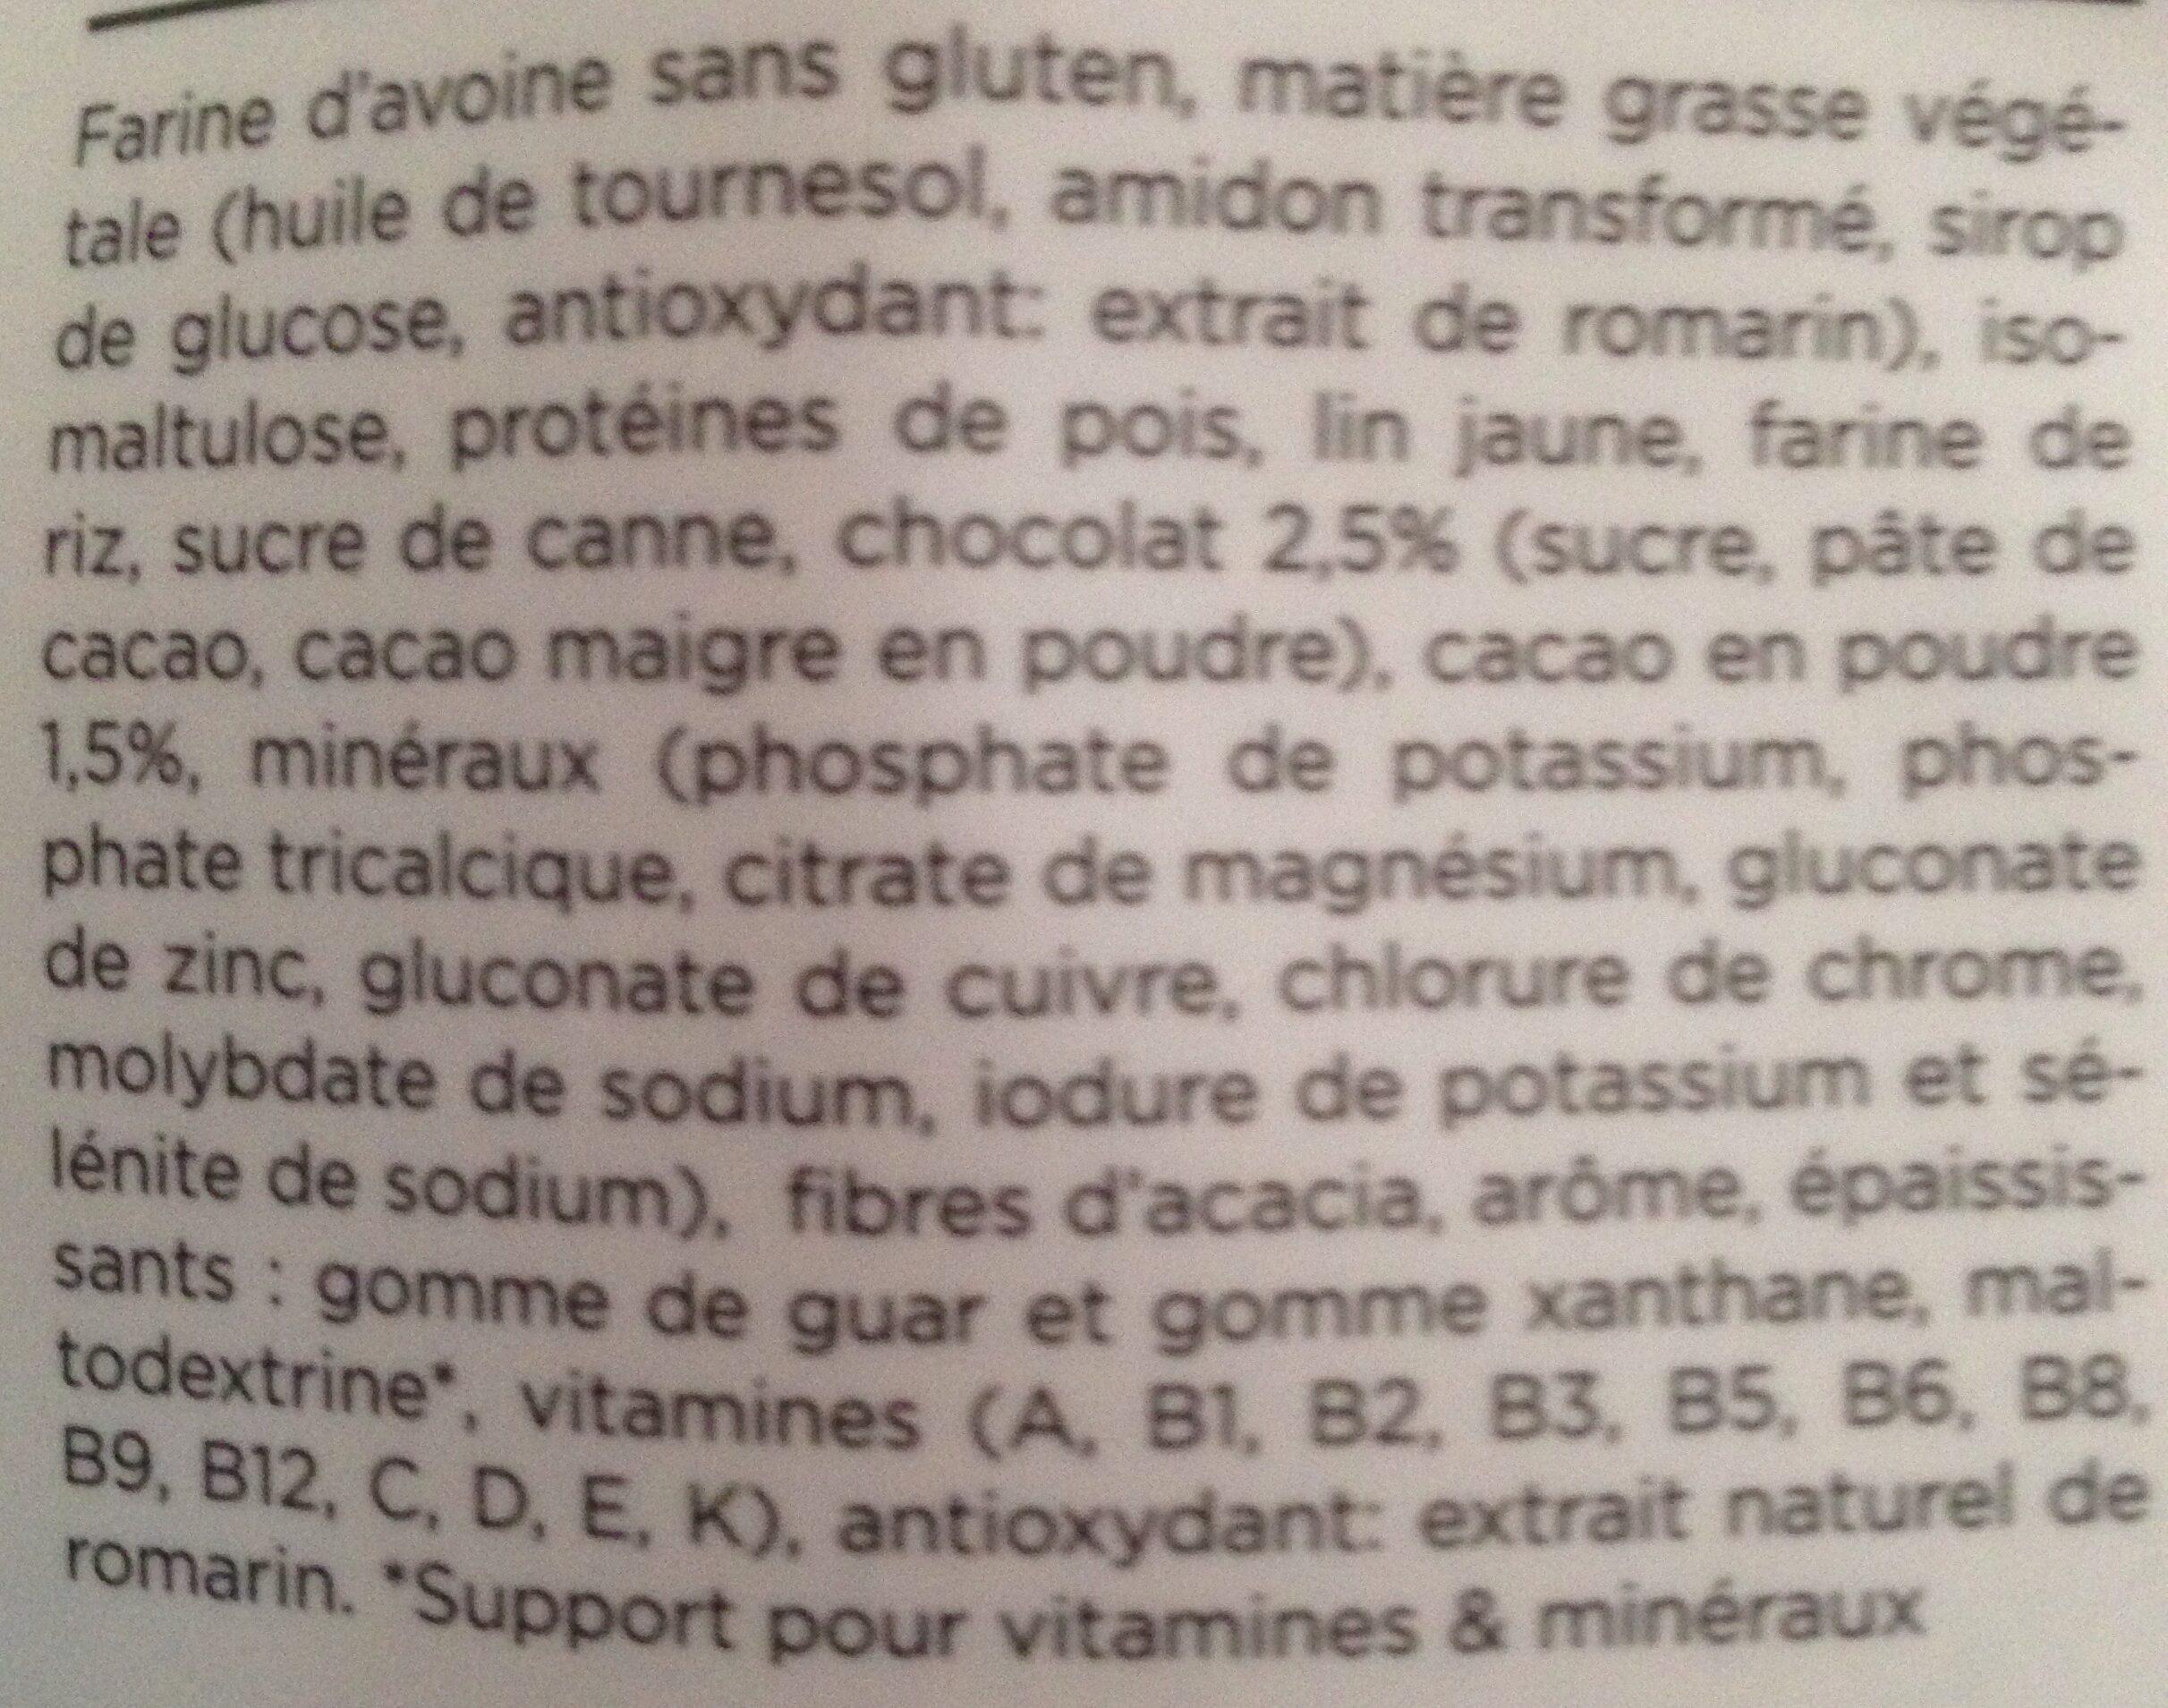 Feed saveur chocolat - Ingrédients - fr